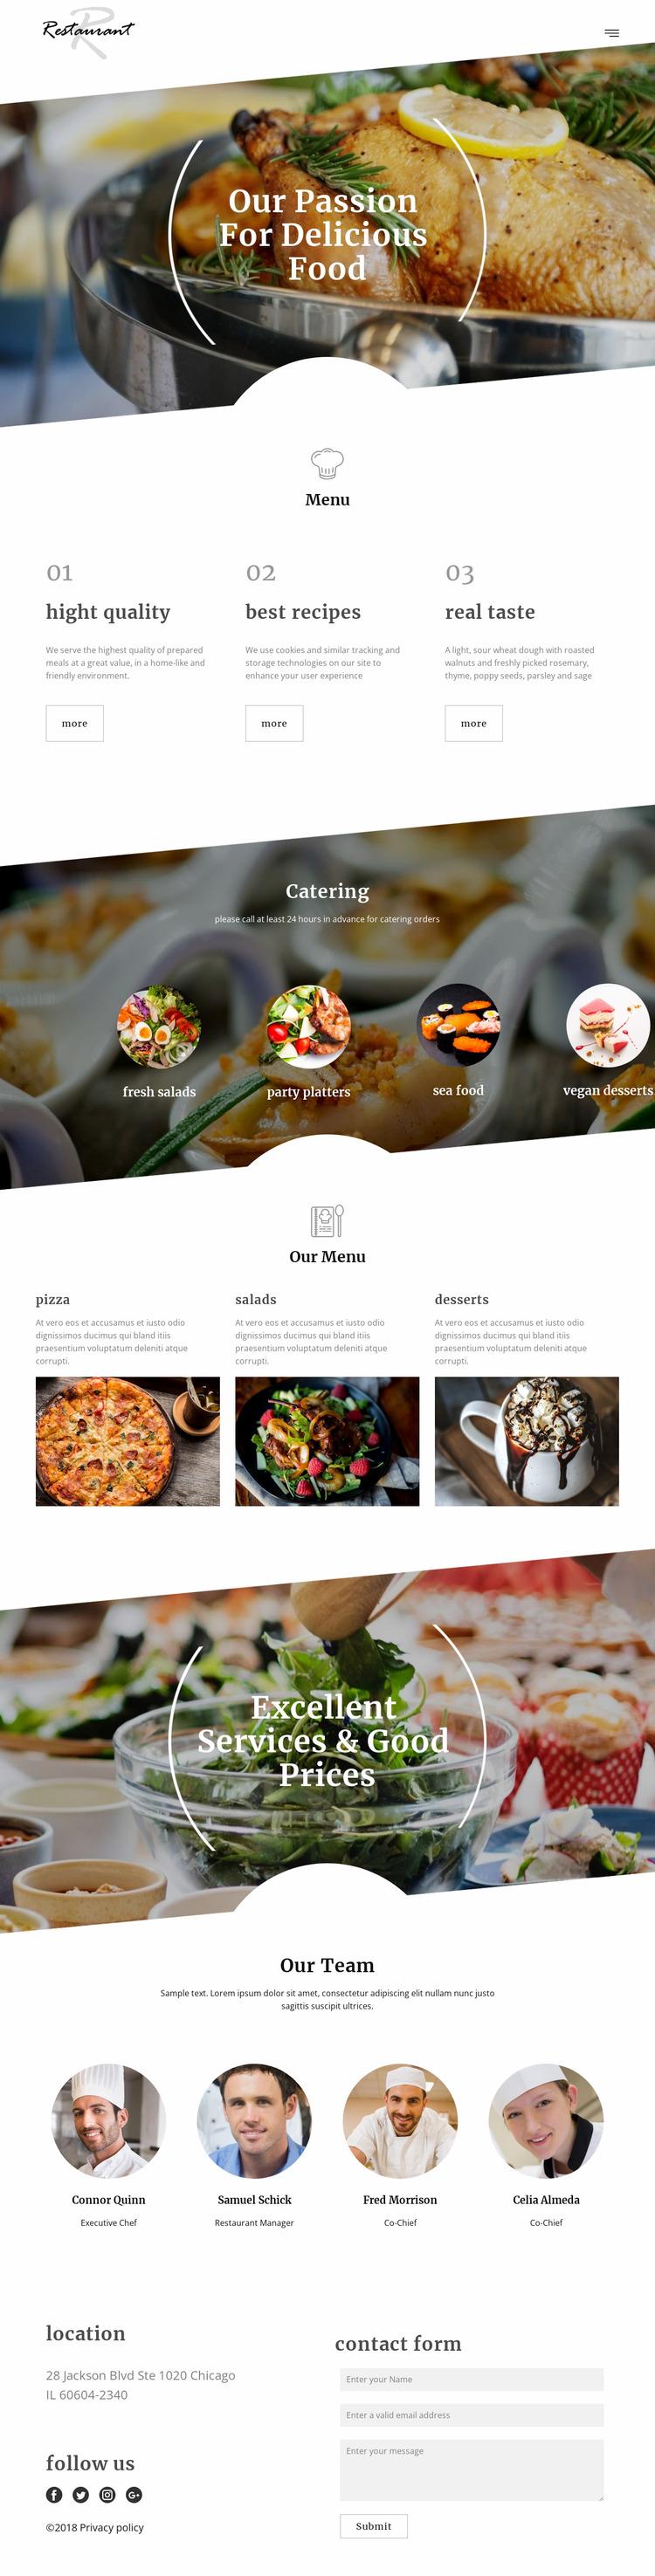 Executive chef recipes WordPress Website Builder